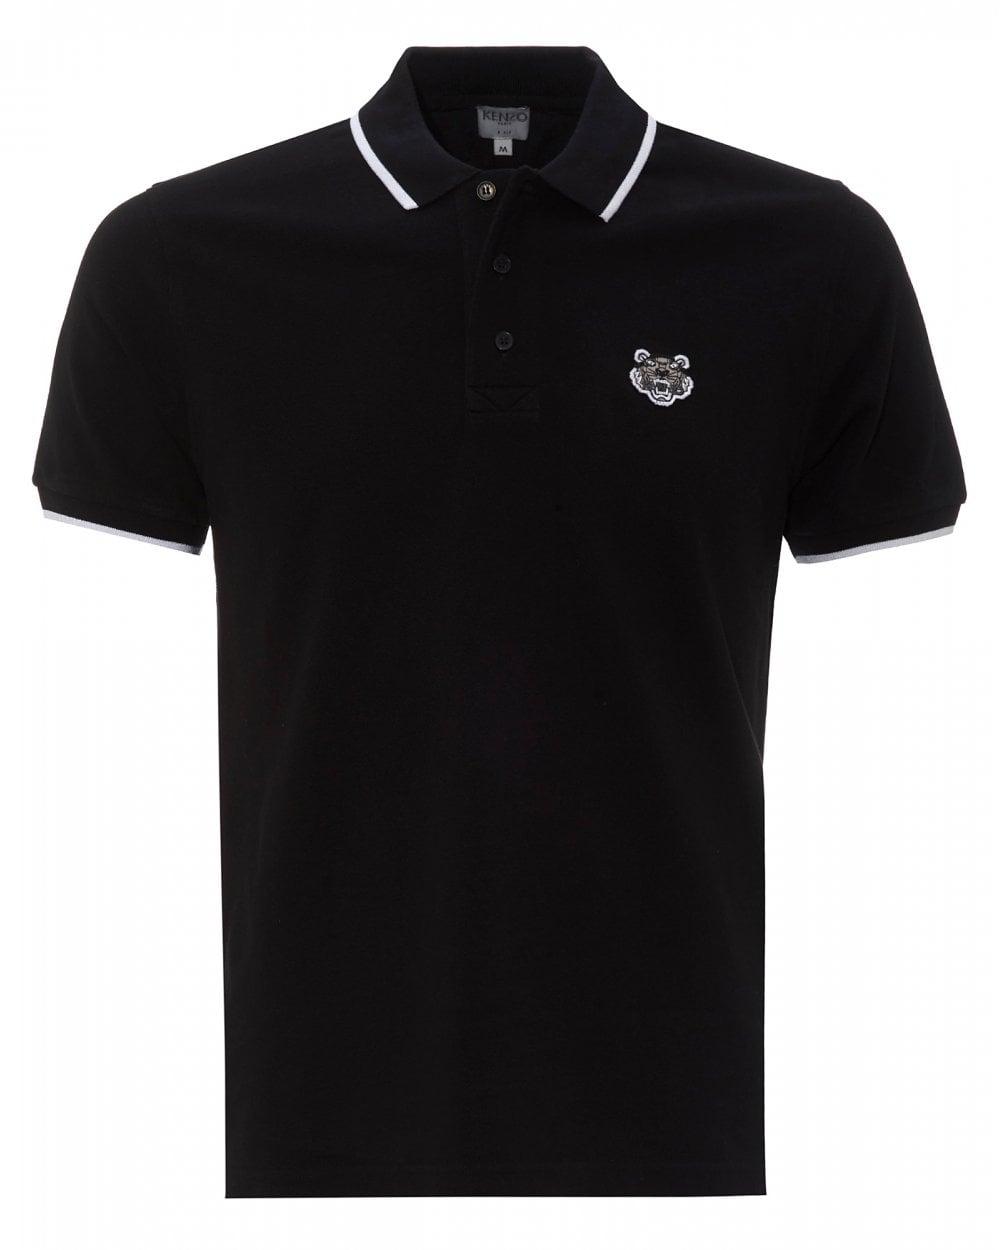 88ebfe42cf Mens Kenzo Black Tiger Crest Polo Shirt